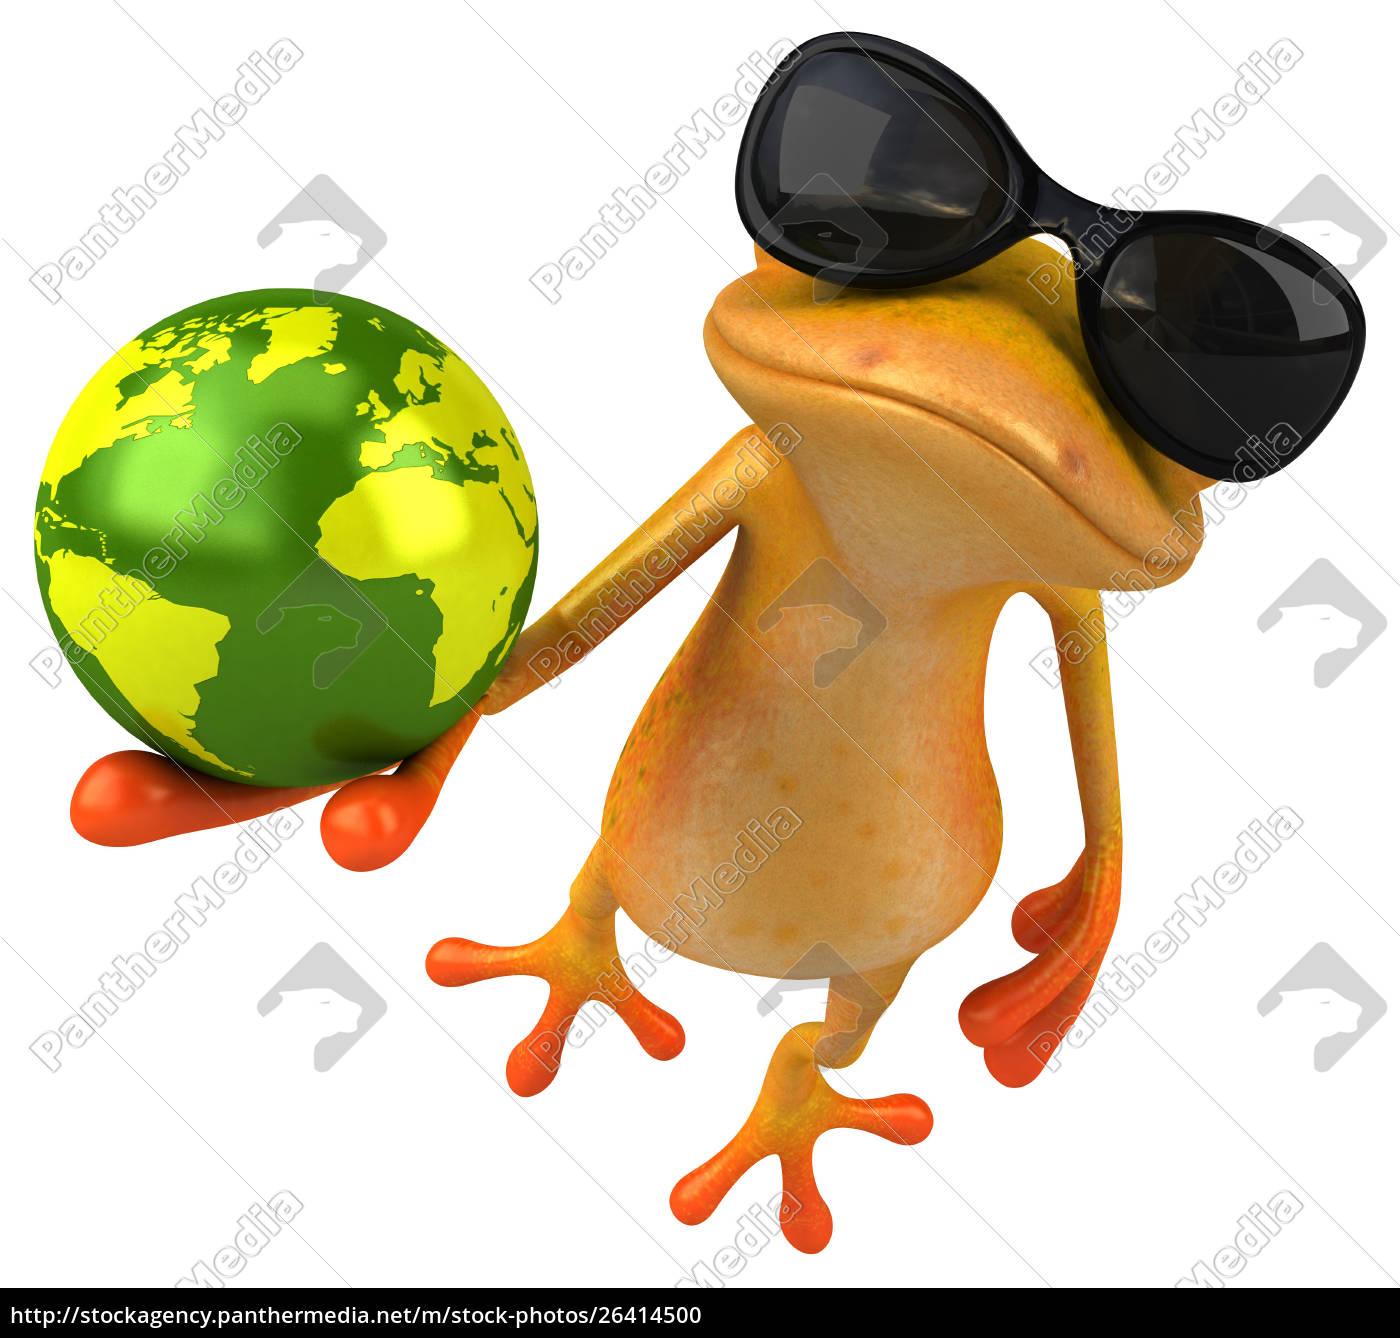 fun, duck, -, 3d, illustration - 26414500